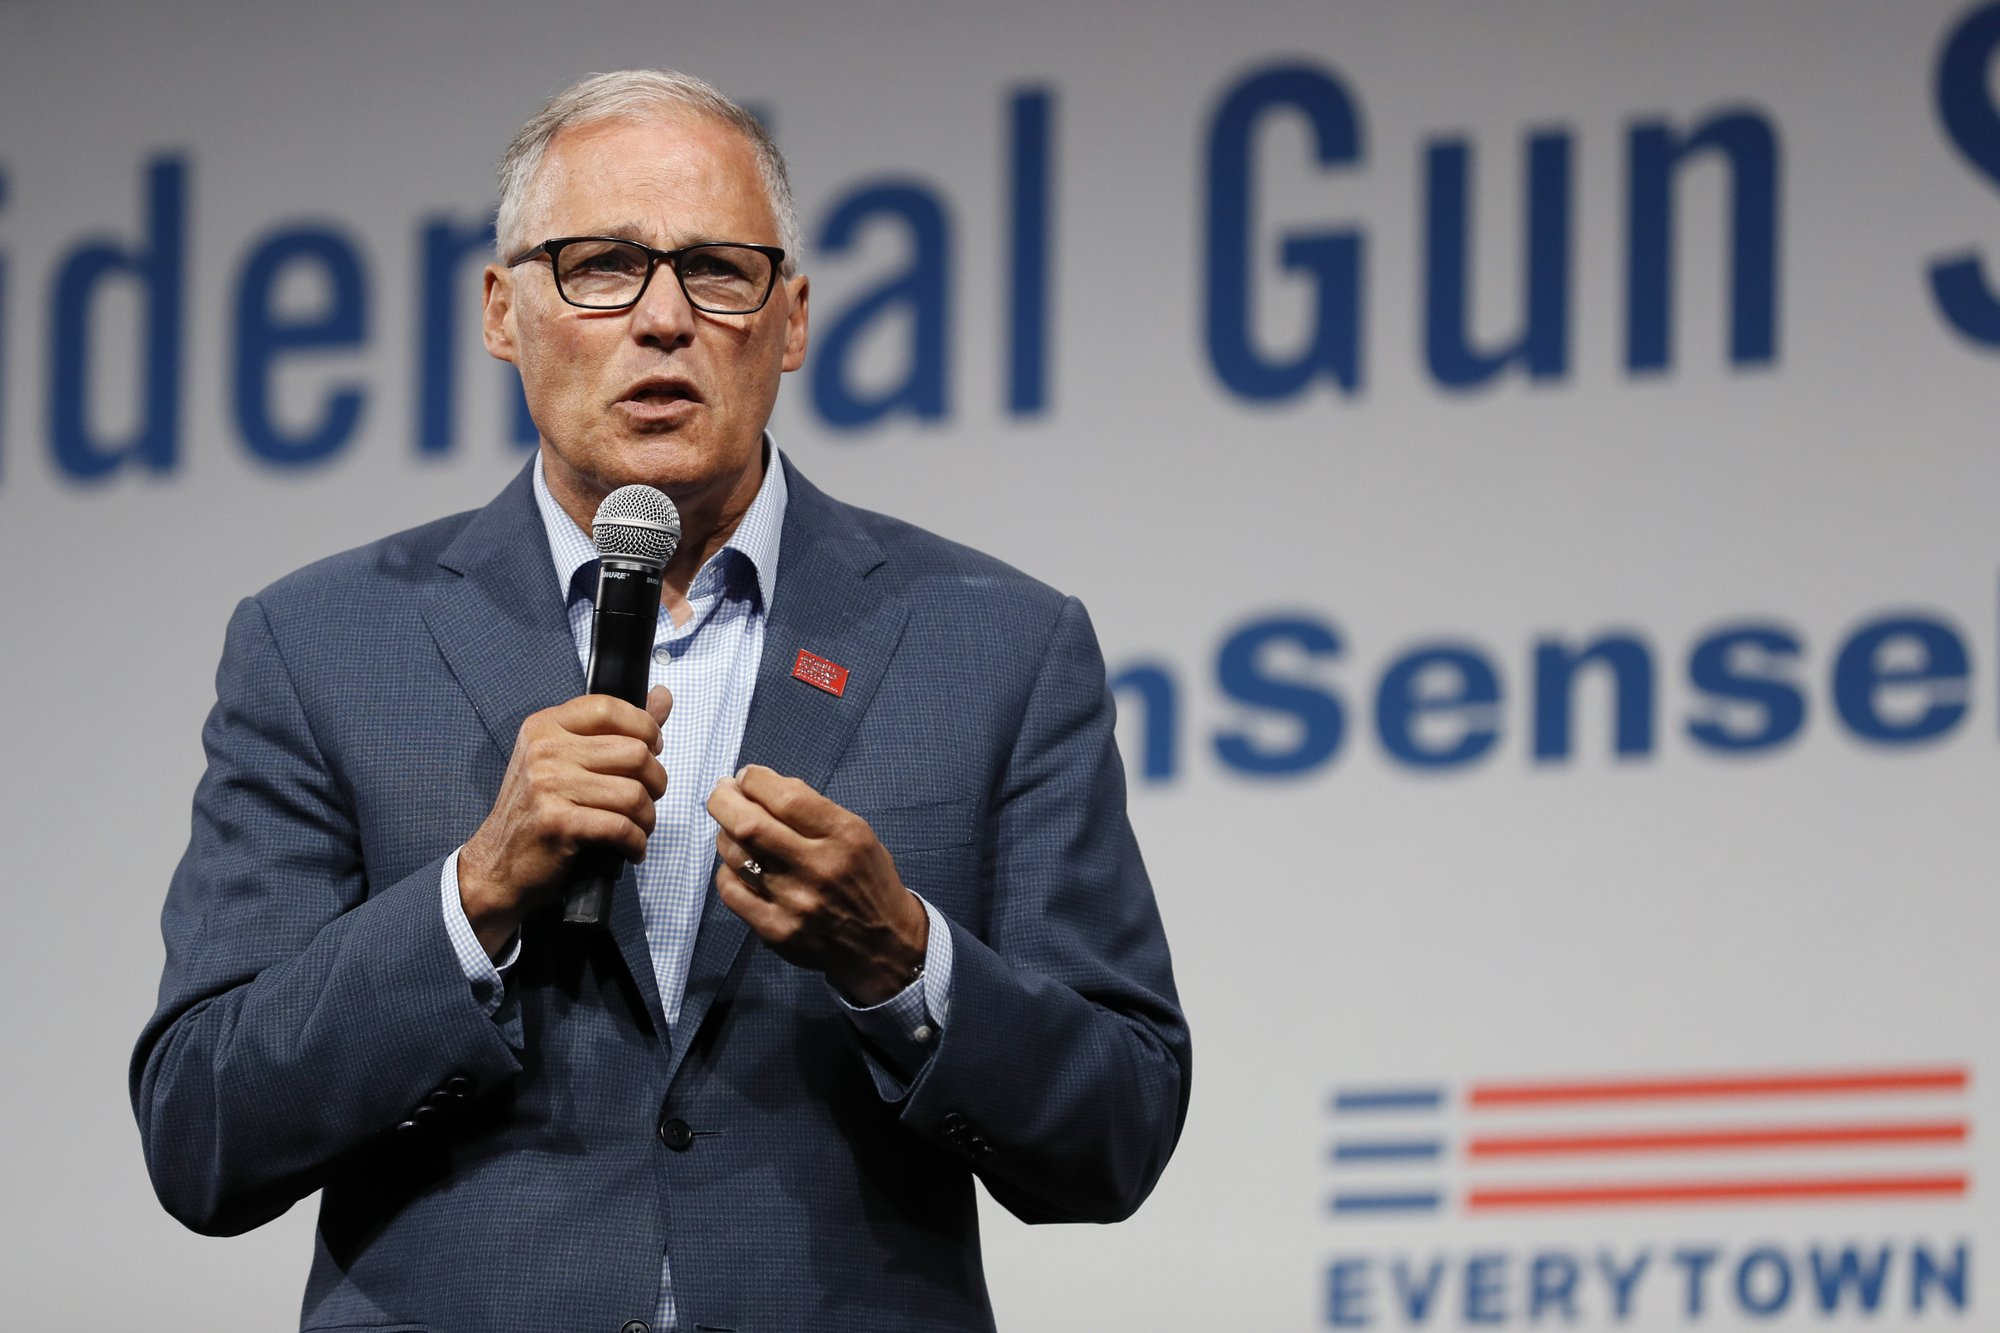 Washington Gov. Jay Inslee says he's ending presidential bid